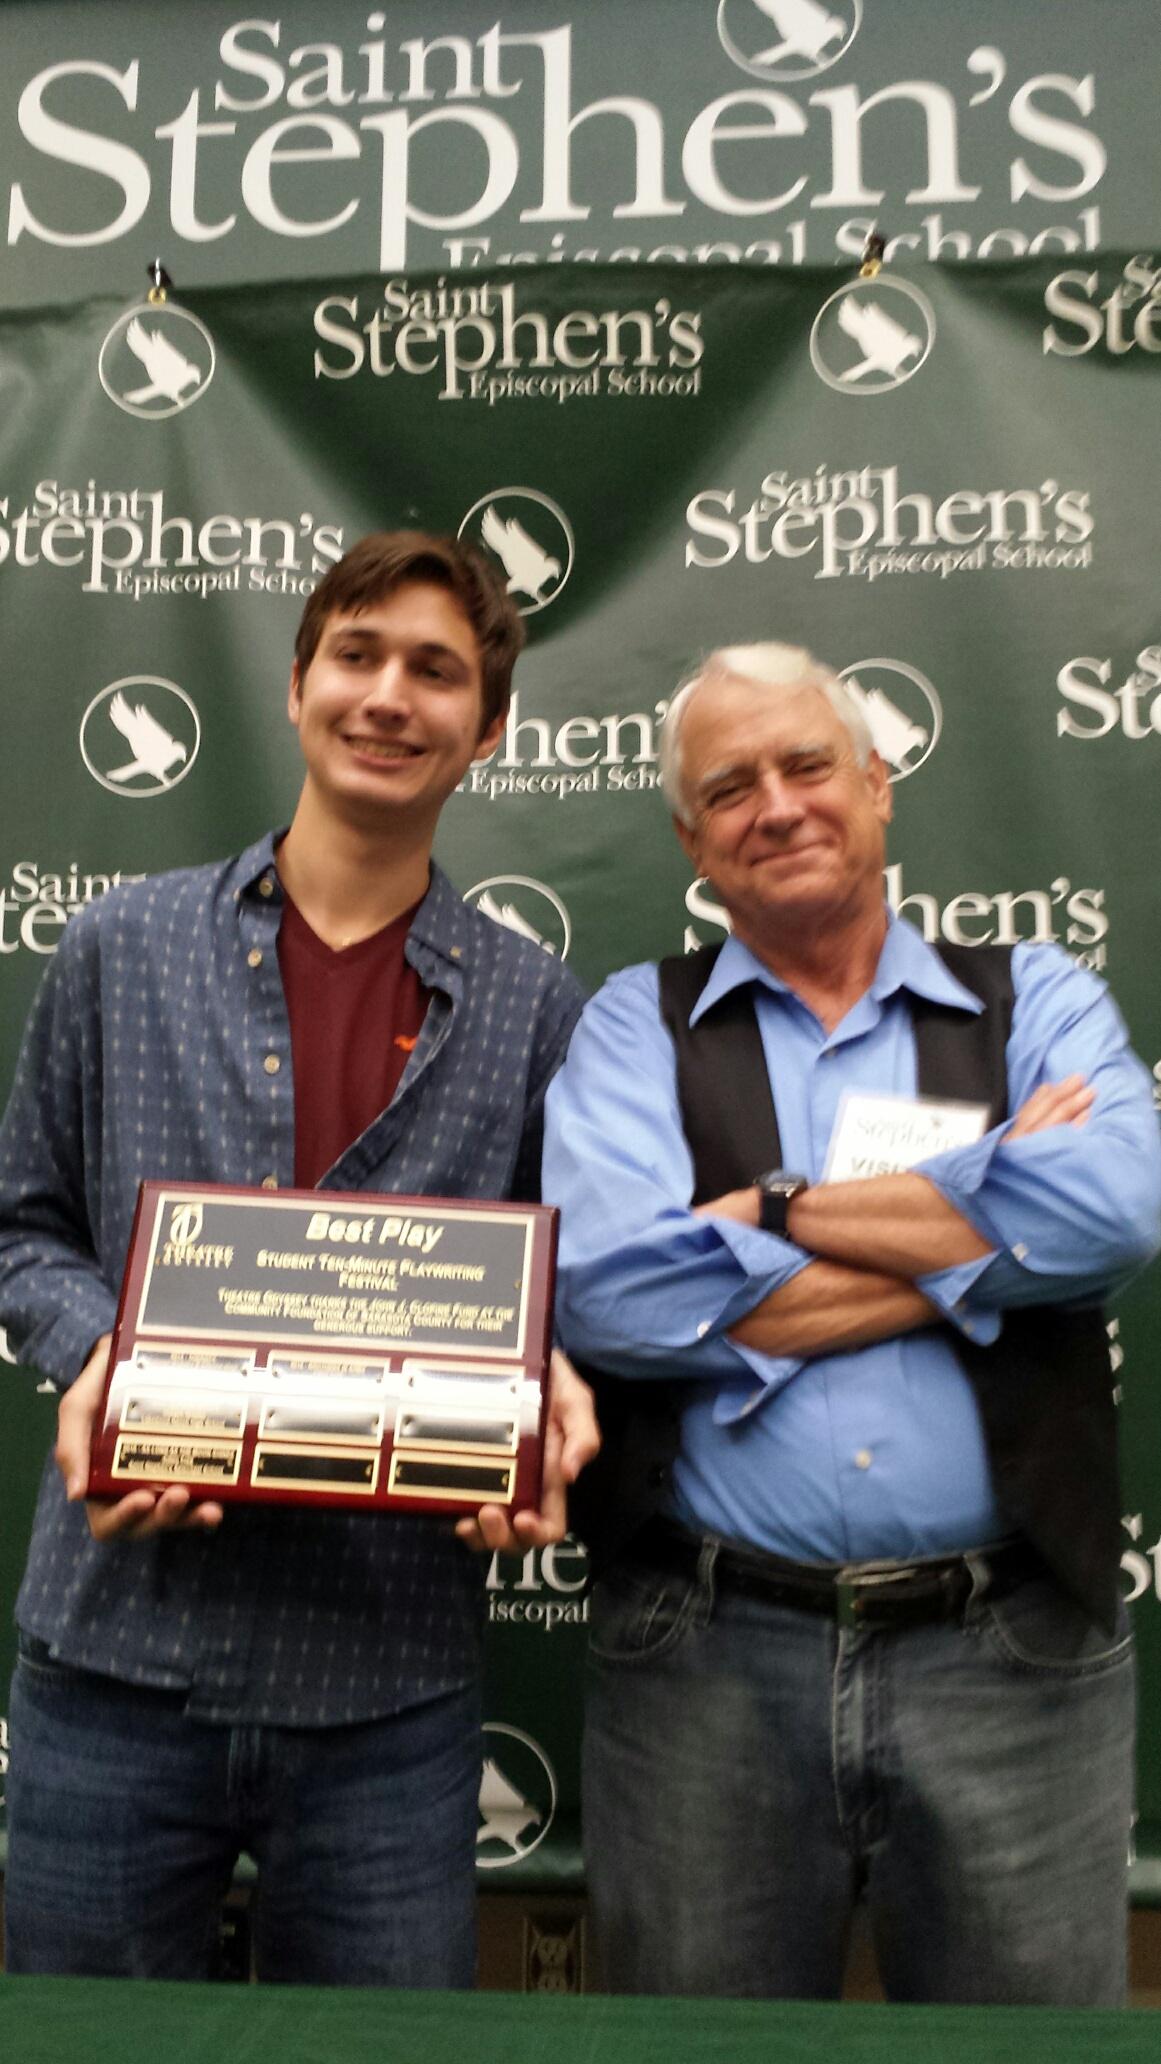 Fourth Annual Student Ten-Minute Playwrighting Festival winner Julien Friej with Director, Preston Boyd